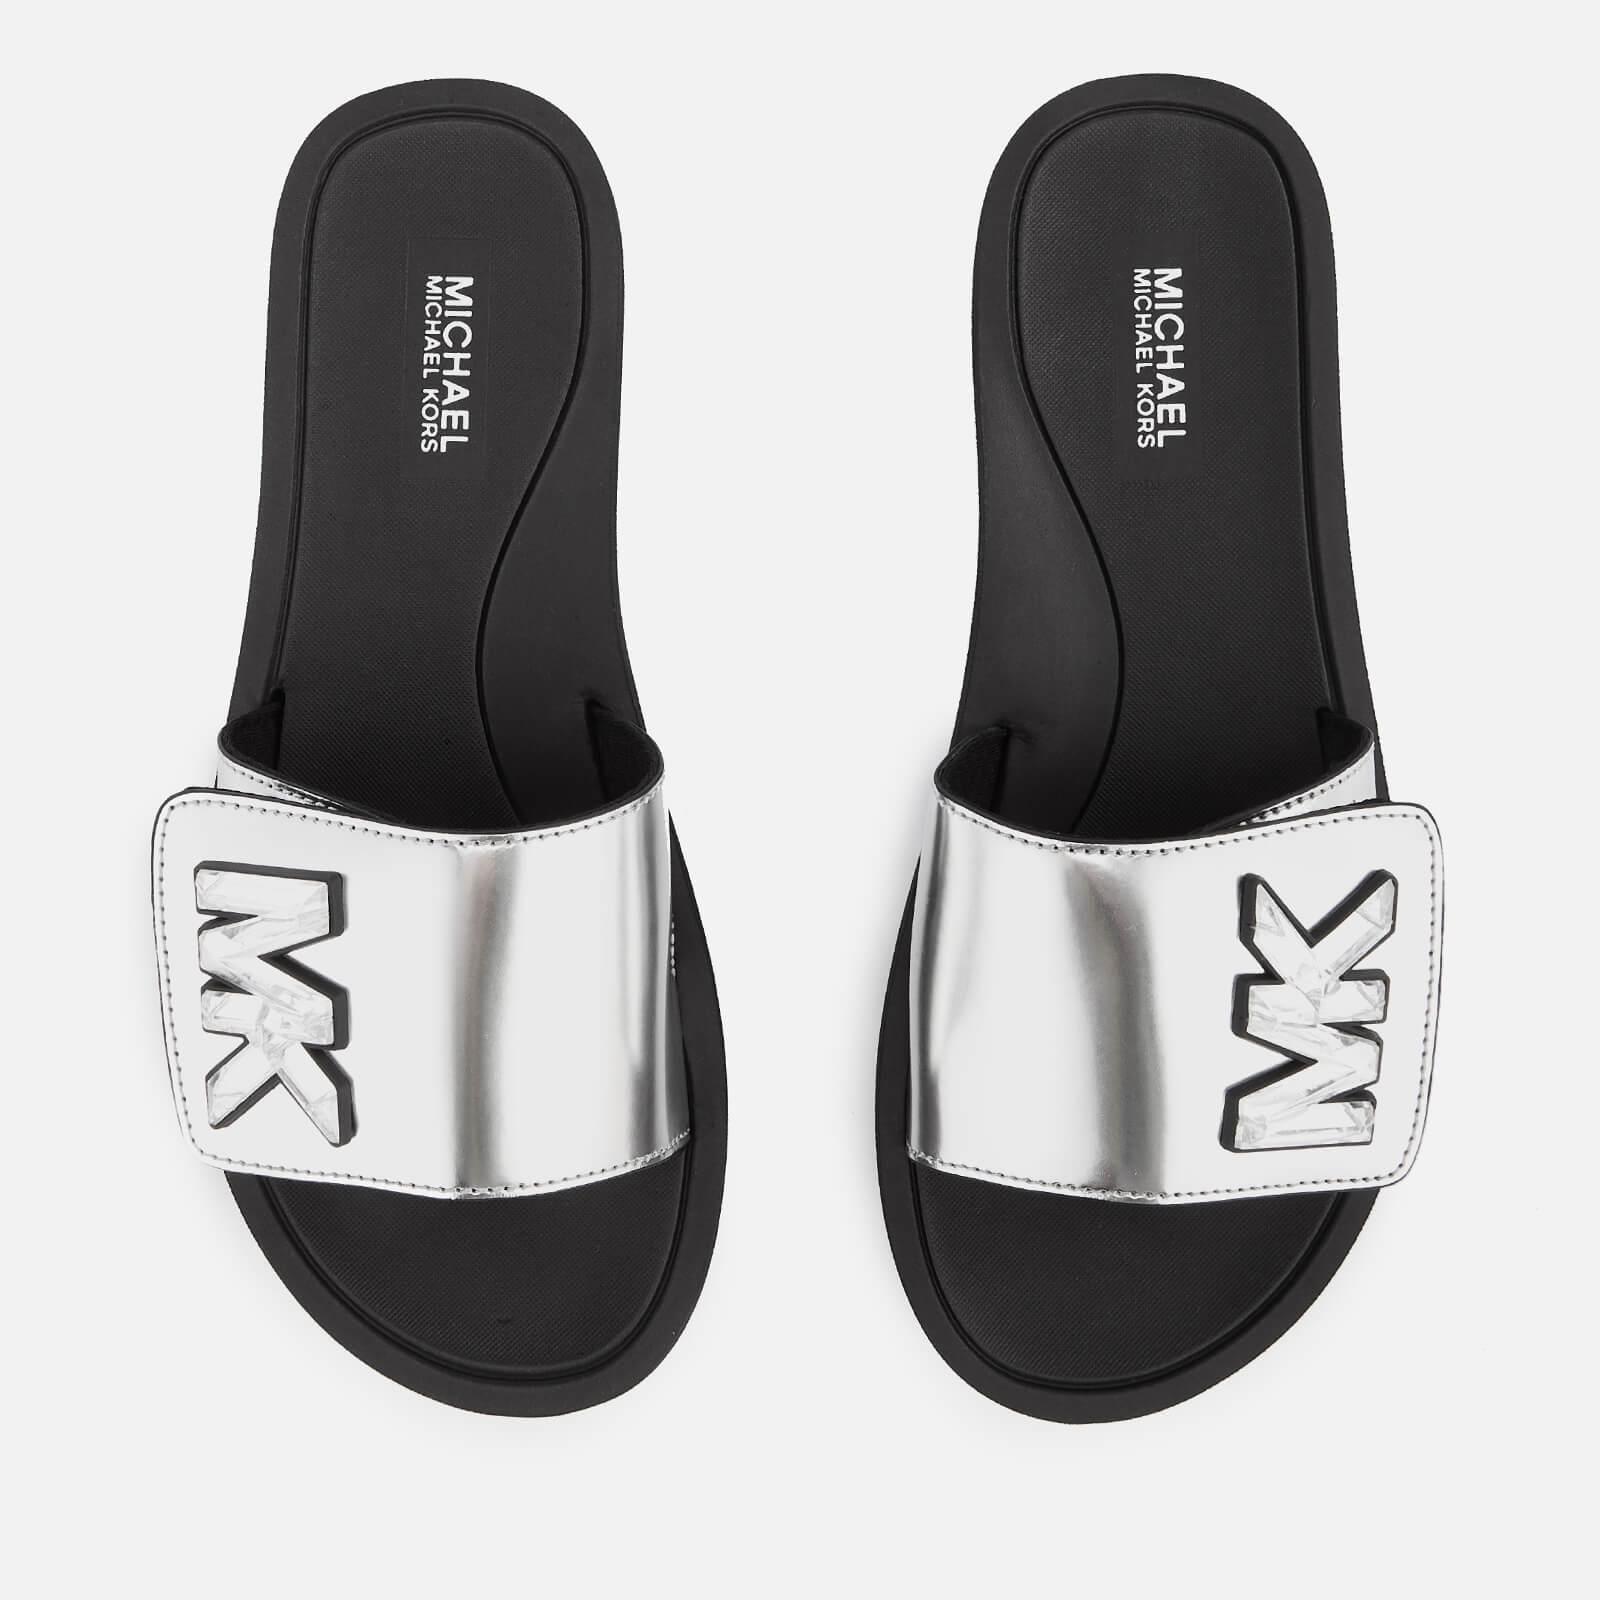 MICHAEL MICHAEL KORS Women's MK Slide Sandals - Silver - UK 4/US 7 - Silver